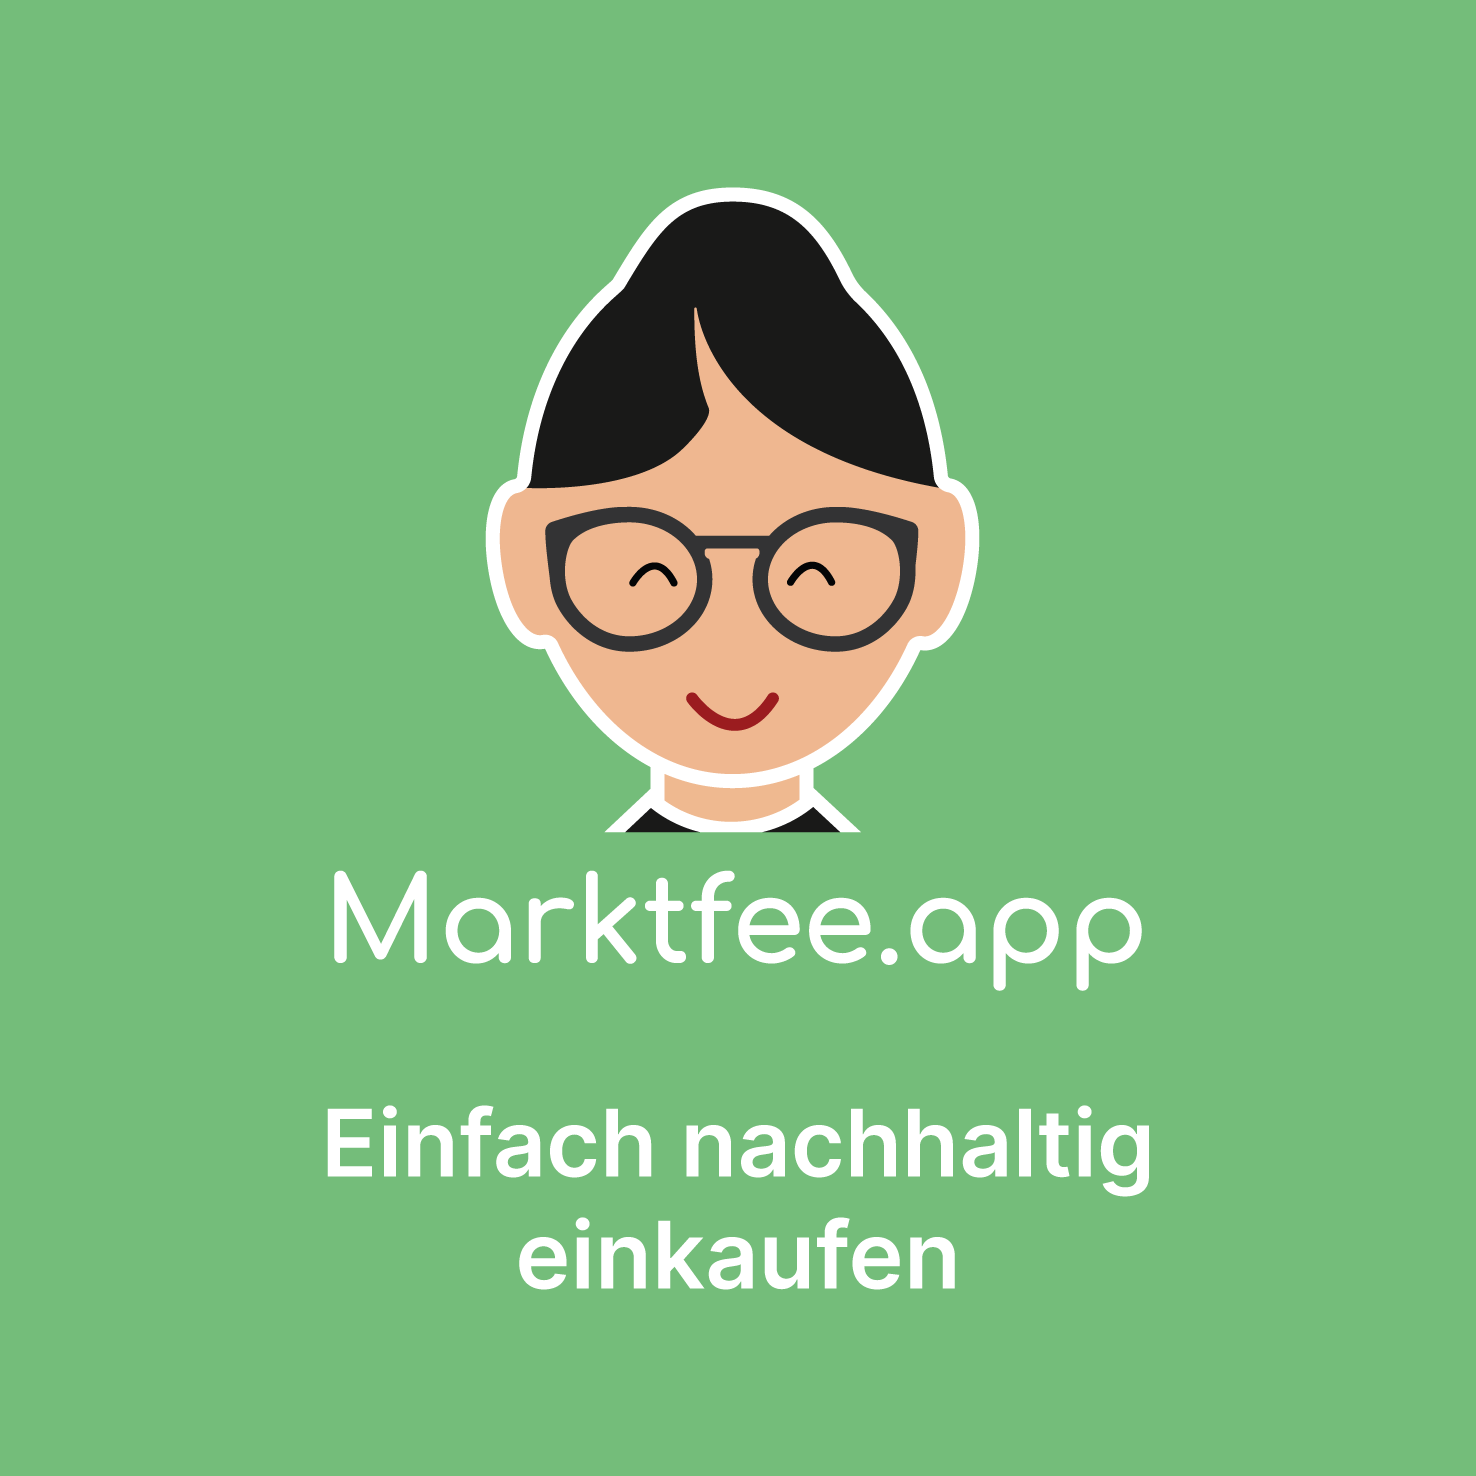 MarktfeeApp